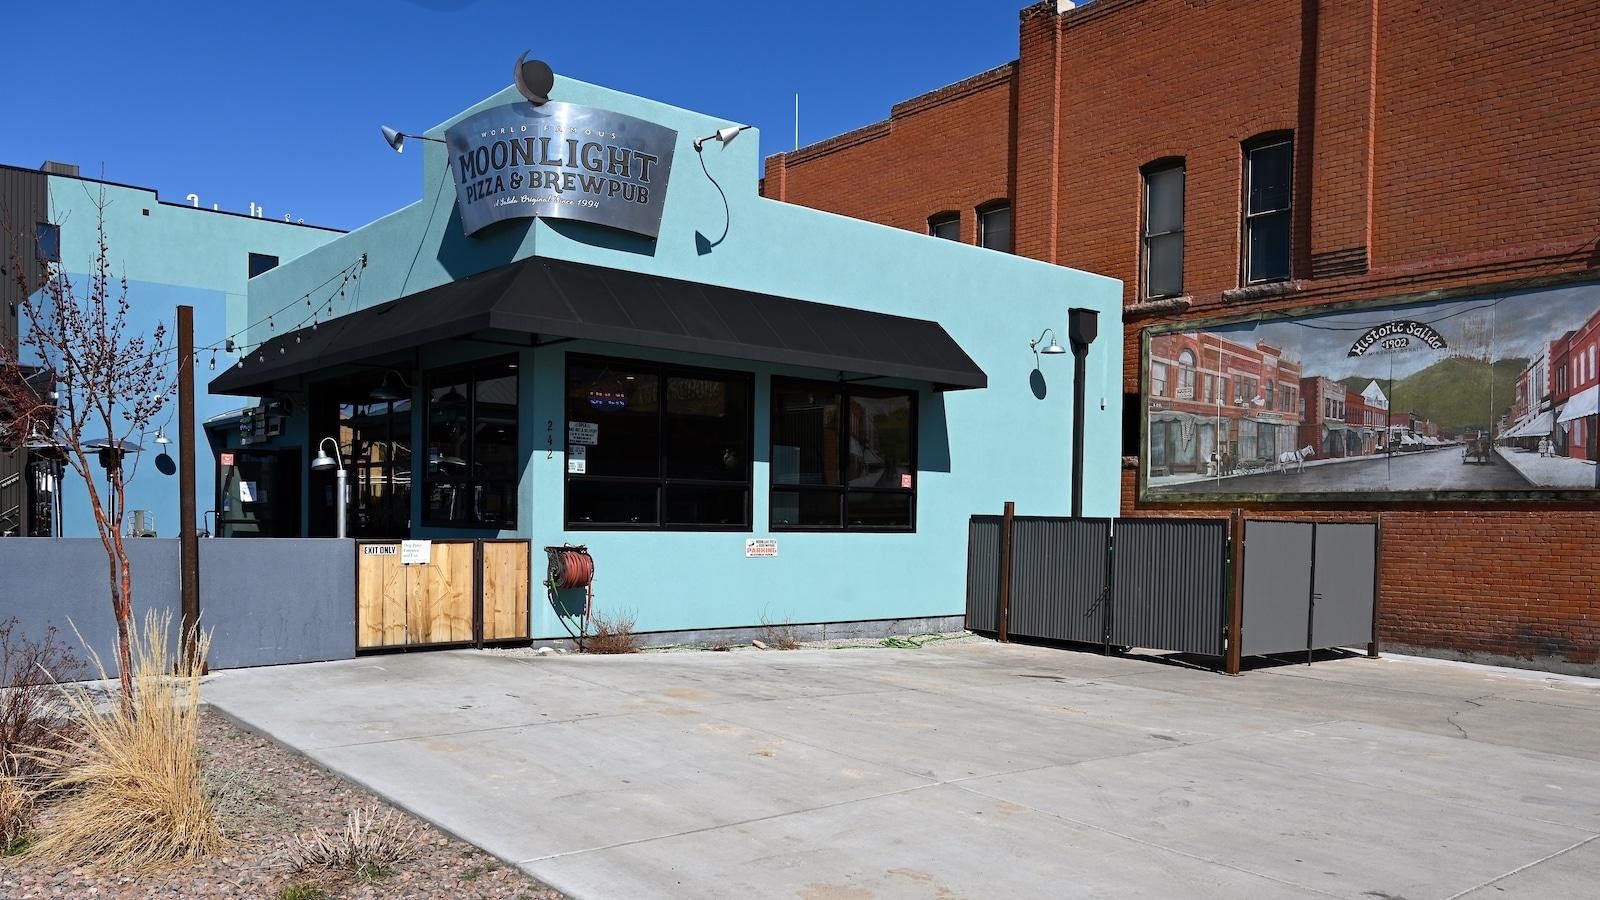 Moonlight Pizza & Brewpub, CO